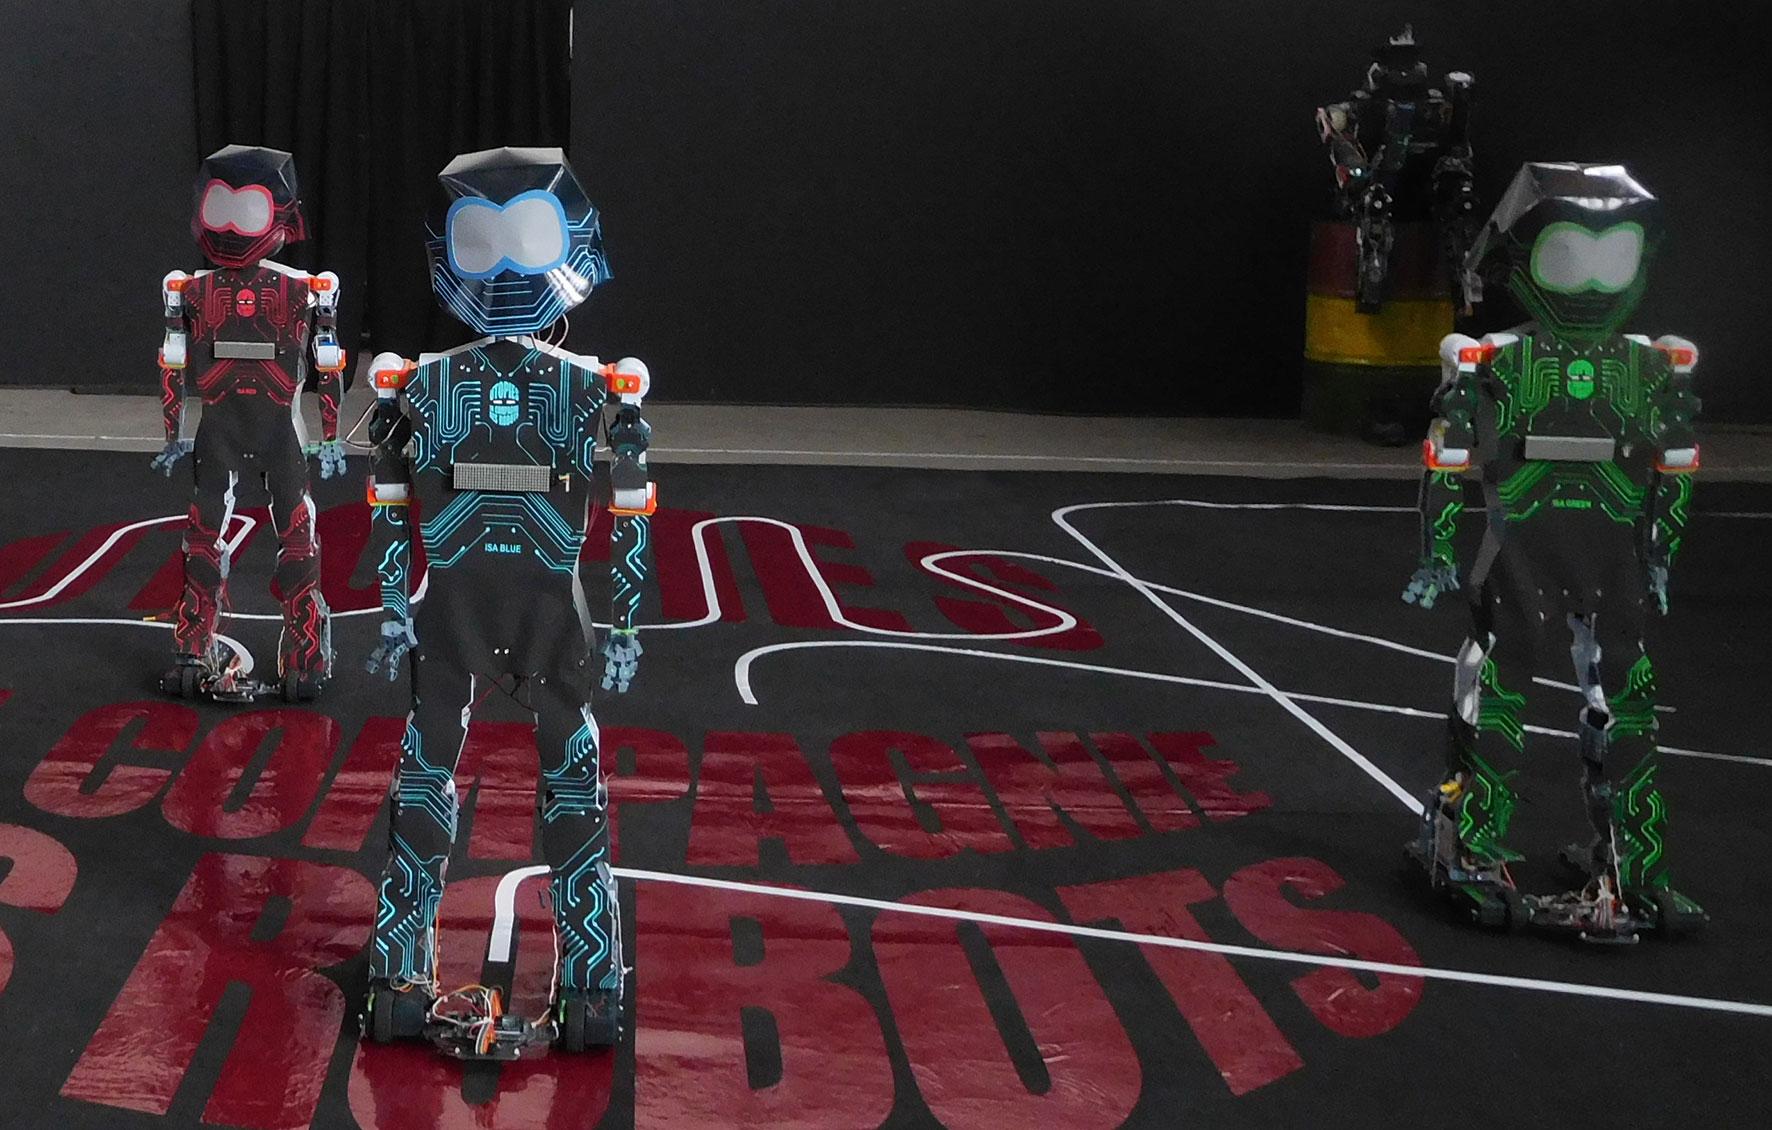 Utopies-en-compagnie-des-robots-ballet-b